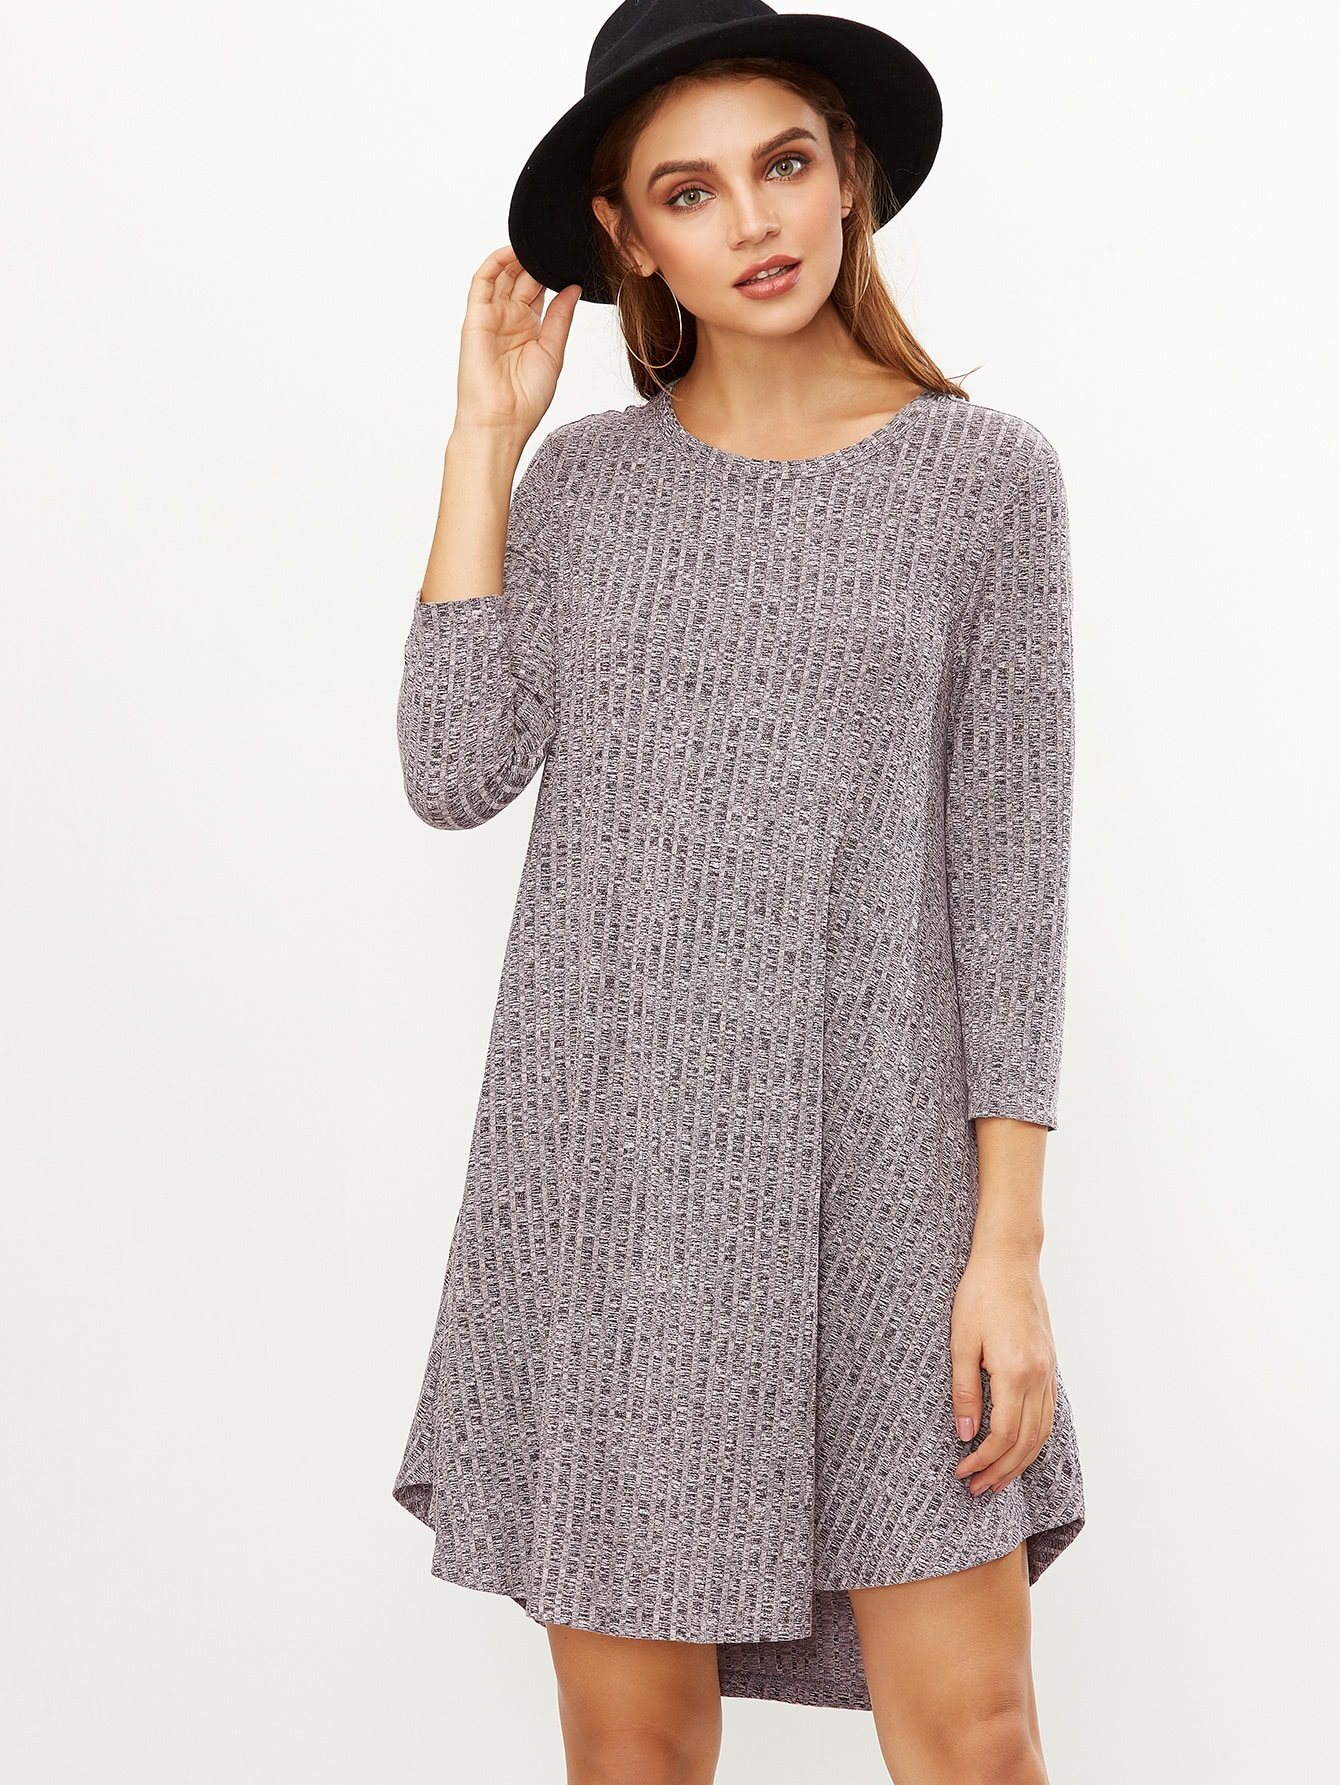 Grey Marled Knit Ribbed Swing Dress